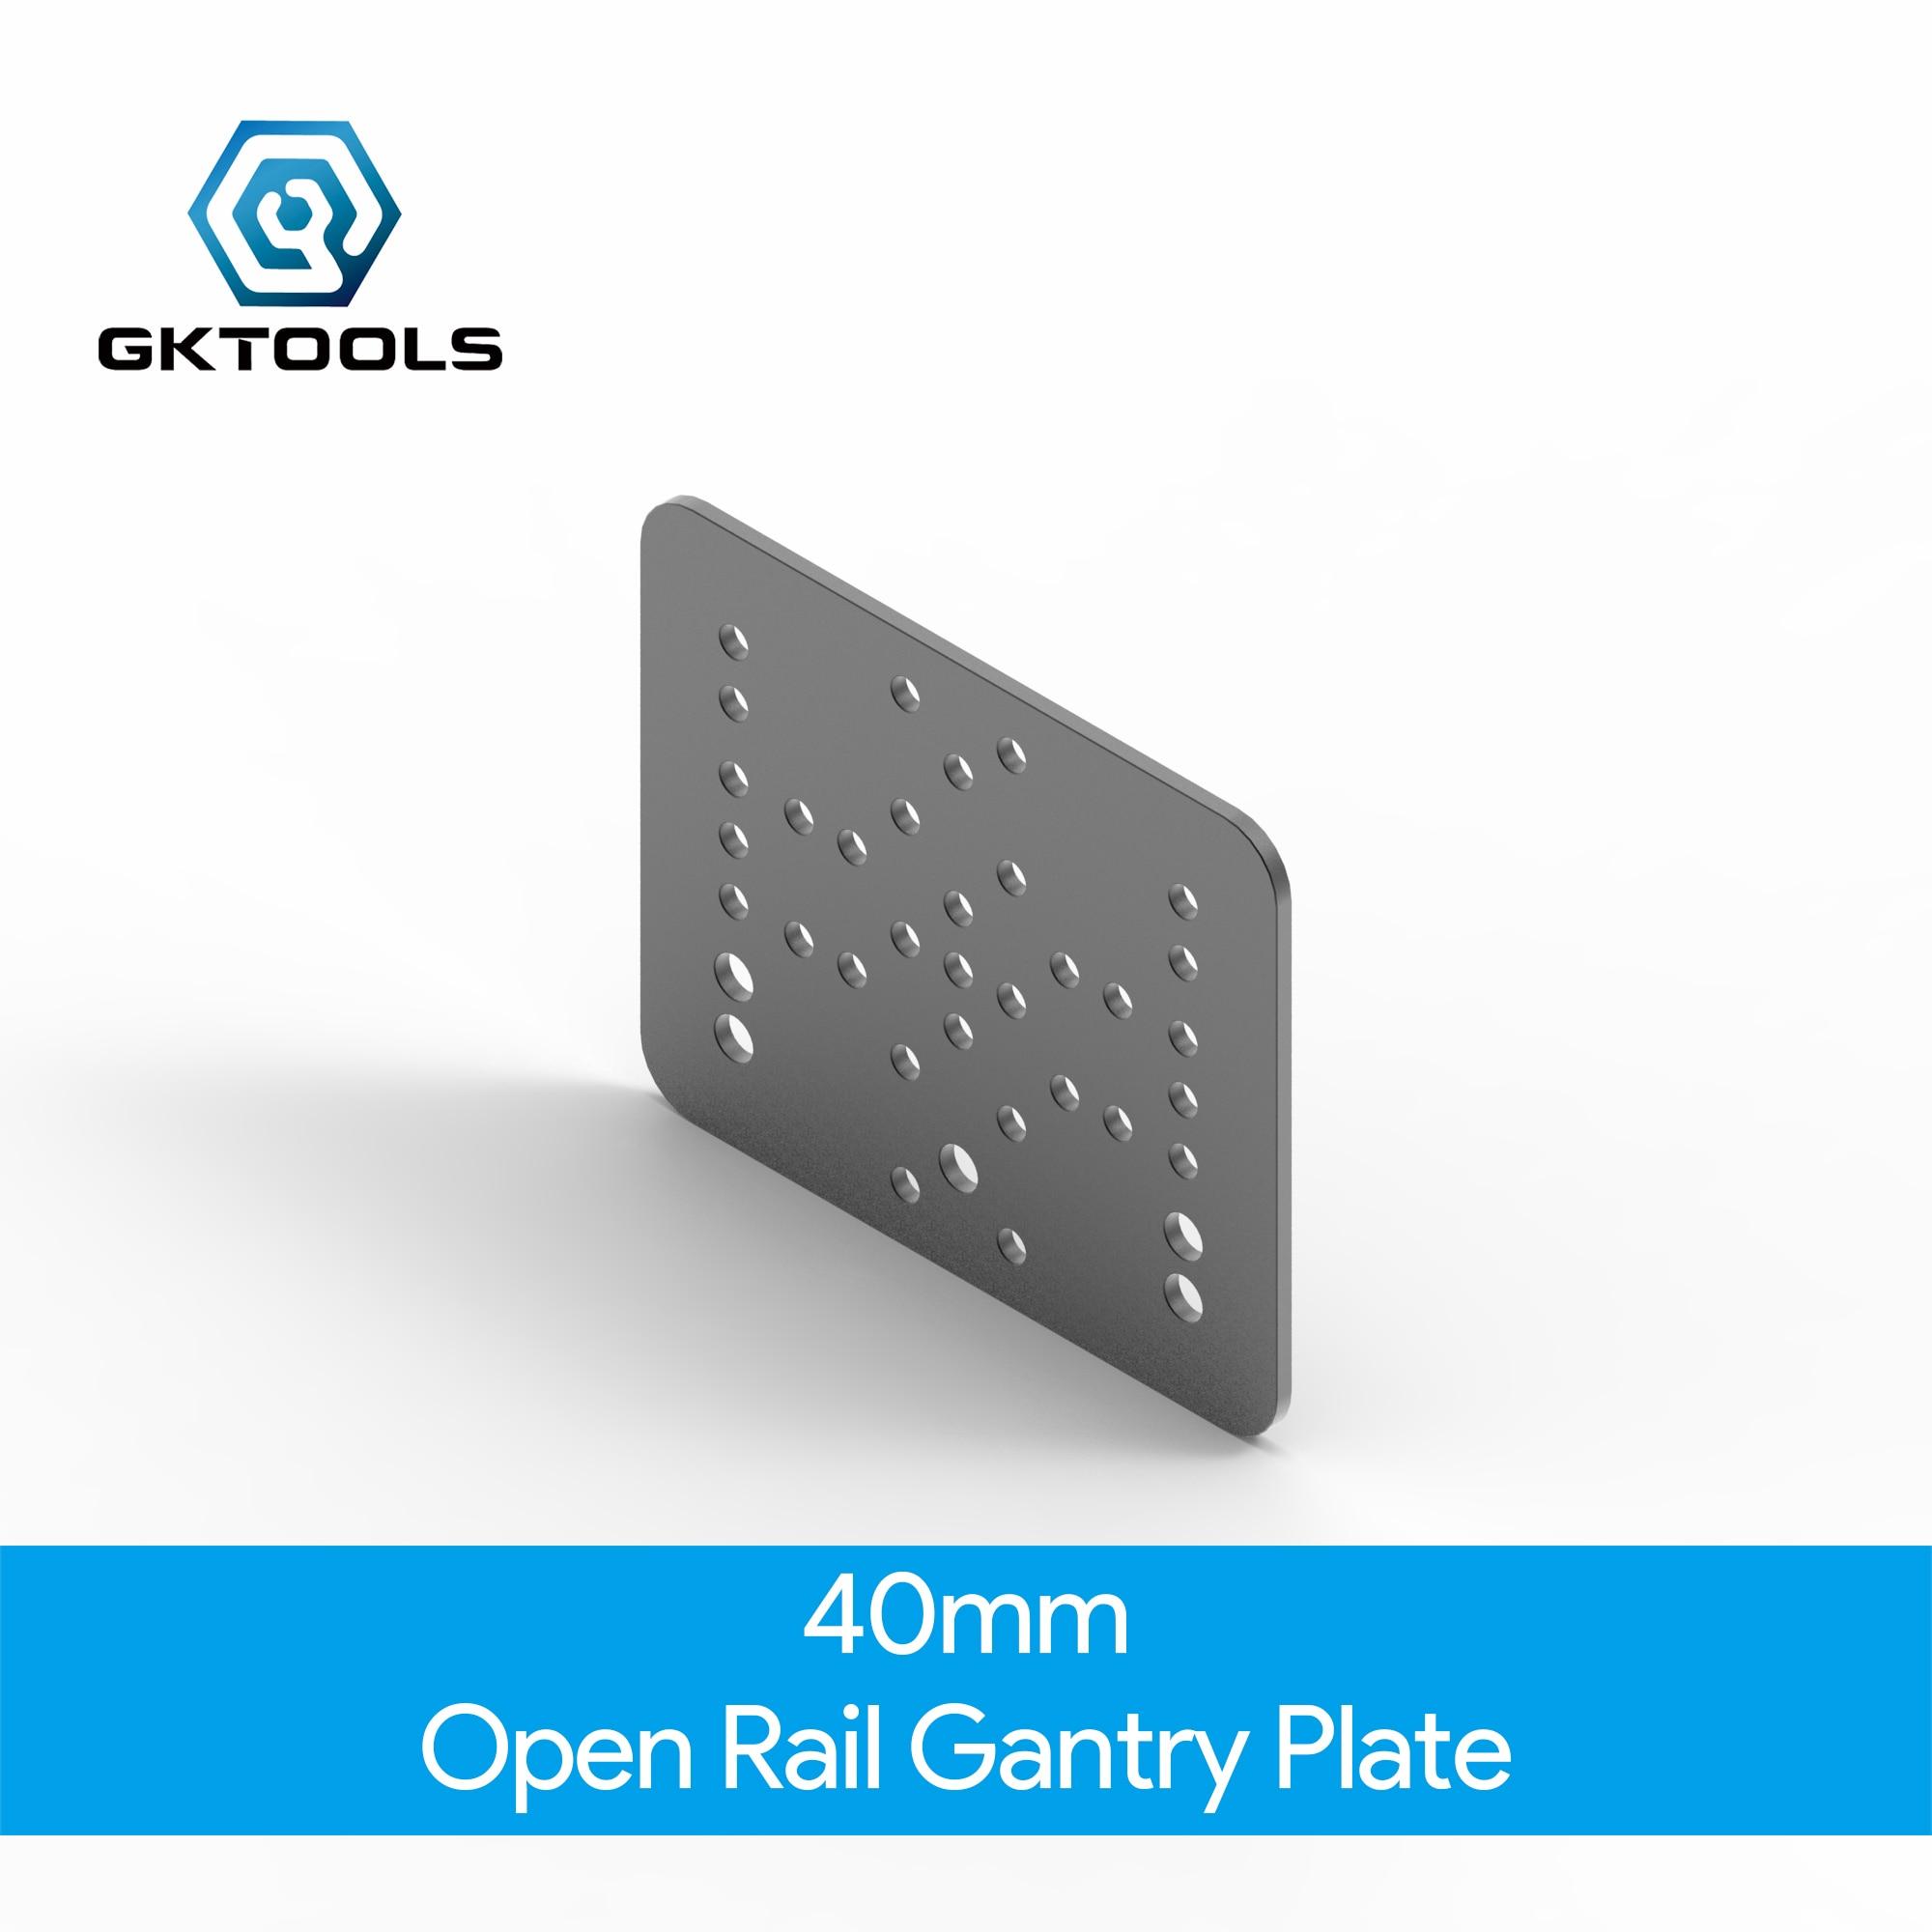 OpenBuilds OpenRail Gantry Plate 40mm